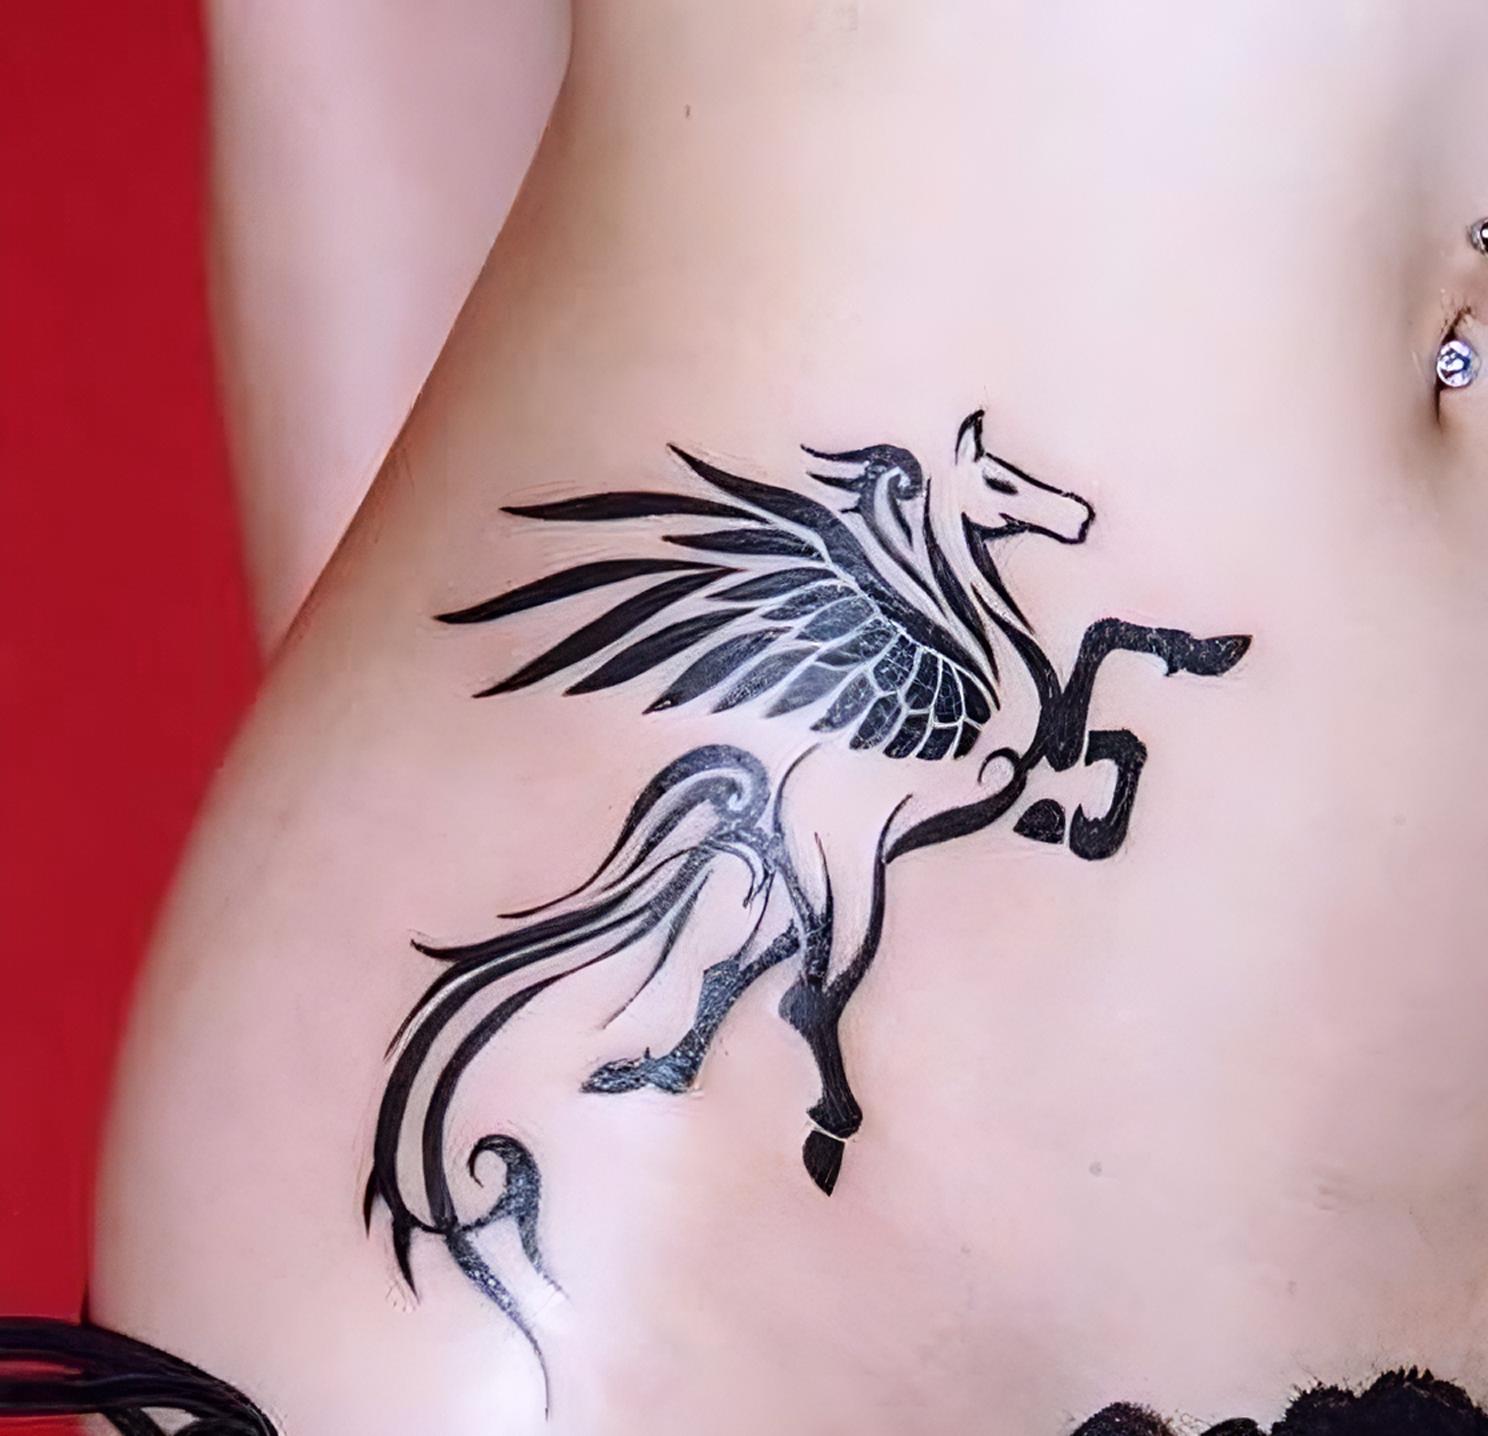 landtiere tattoo fotogalerie spinnen hunde schlangen. Black Bedroom Furniture Sets. Home Design Ideas